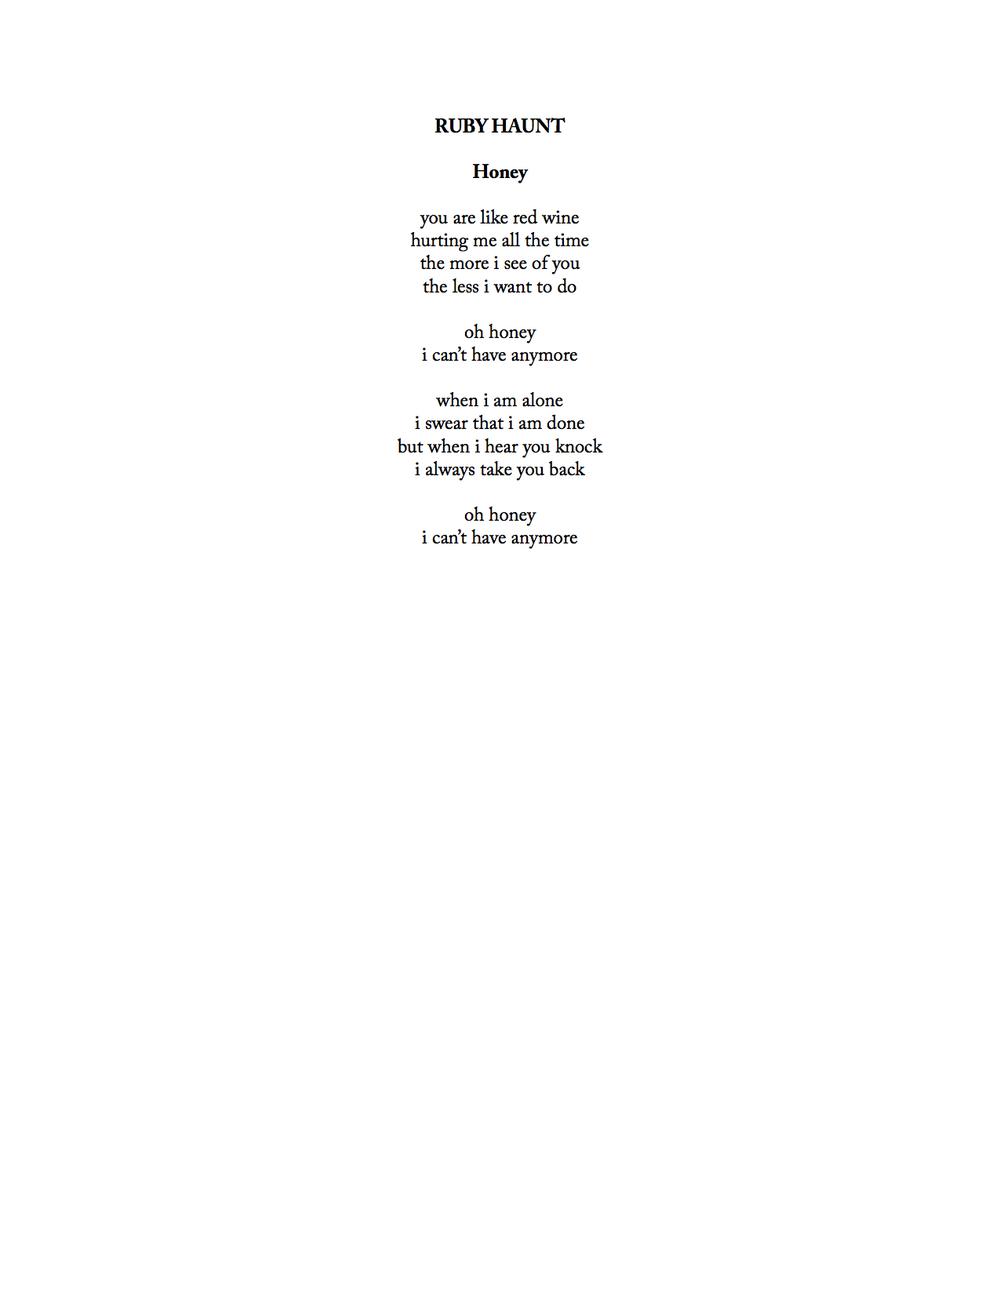 ruby haunt - honey